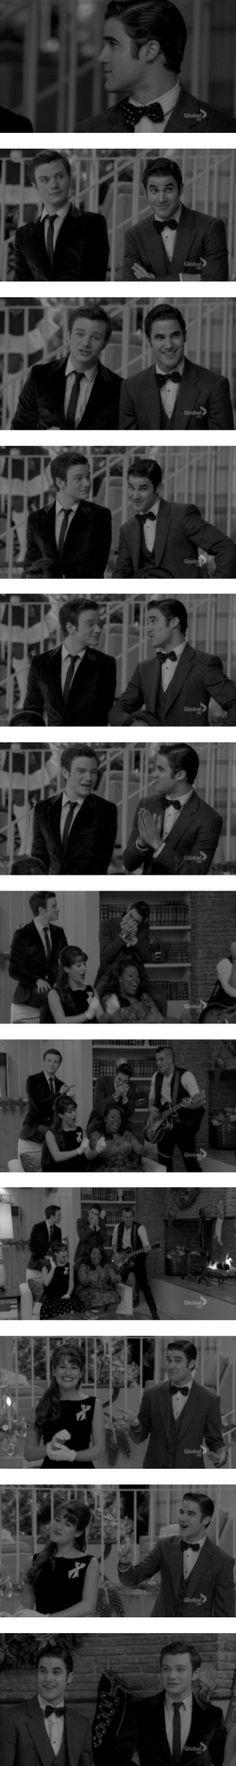 """Extraordinary Merry Christmas (Kurt/Blaine/Klaine Screencaps)"" by darrenfreakingcriss ❤ liked on Polyvore"